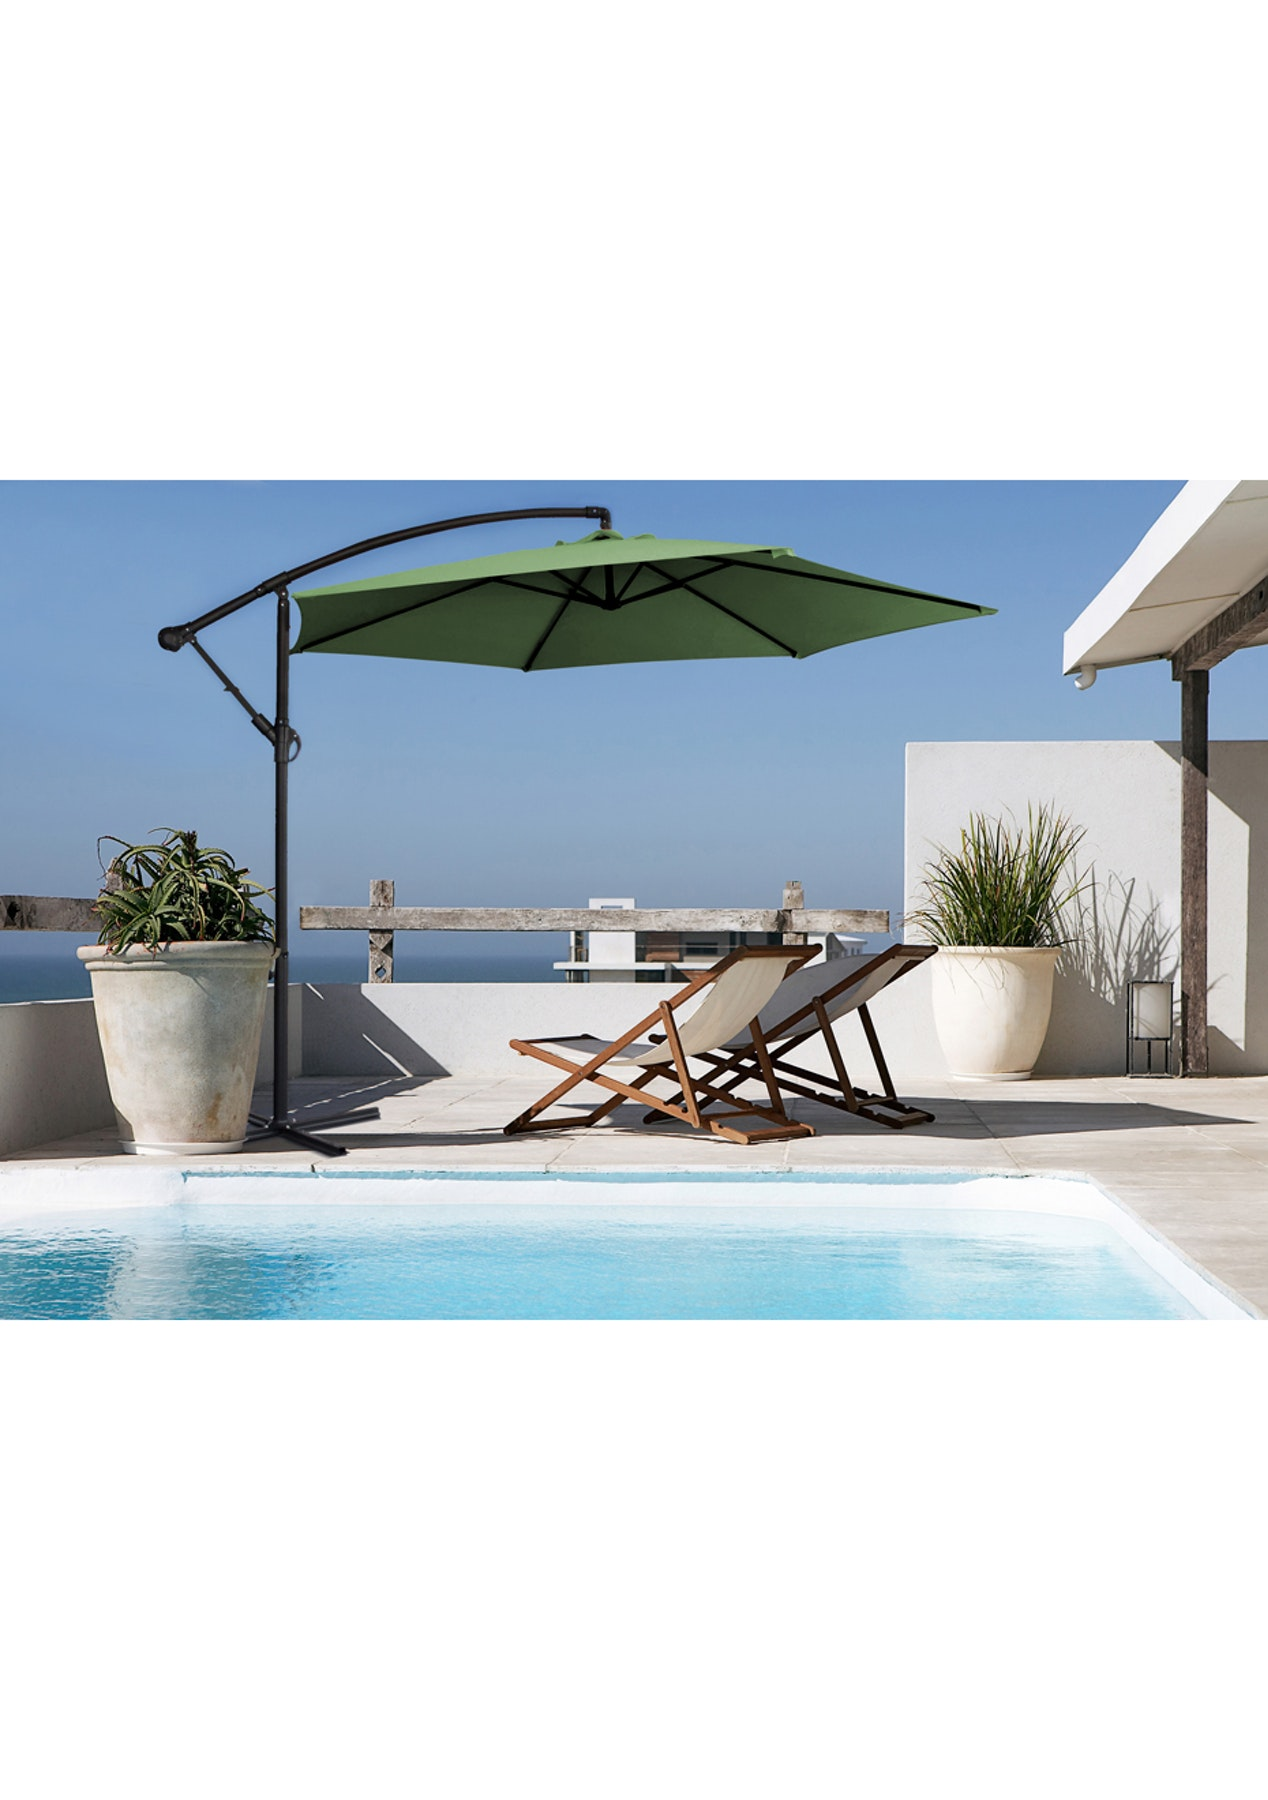 34969a7835 Milano Outdoor - Outdoor 3 Meter Hanging and Folding Umbrella - Green